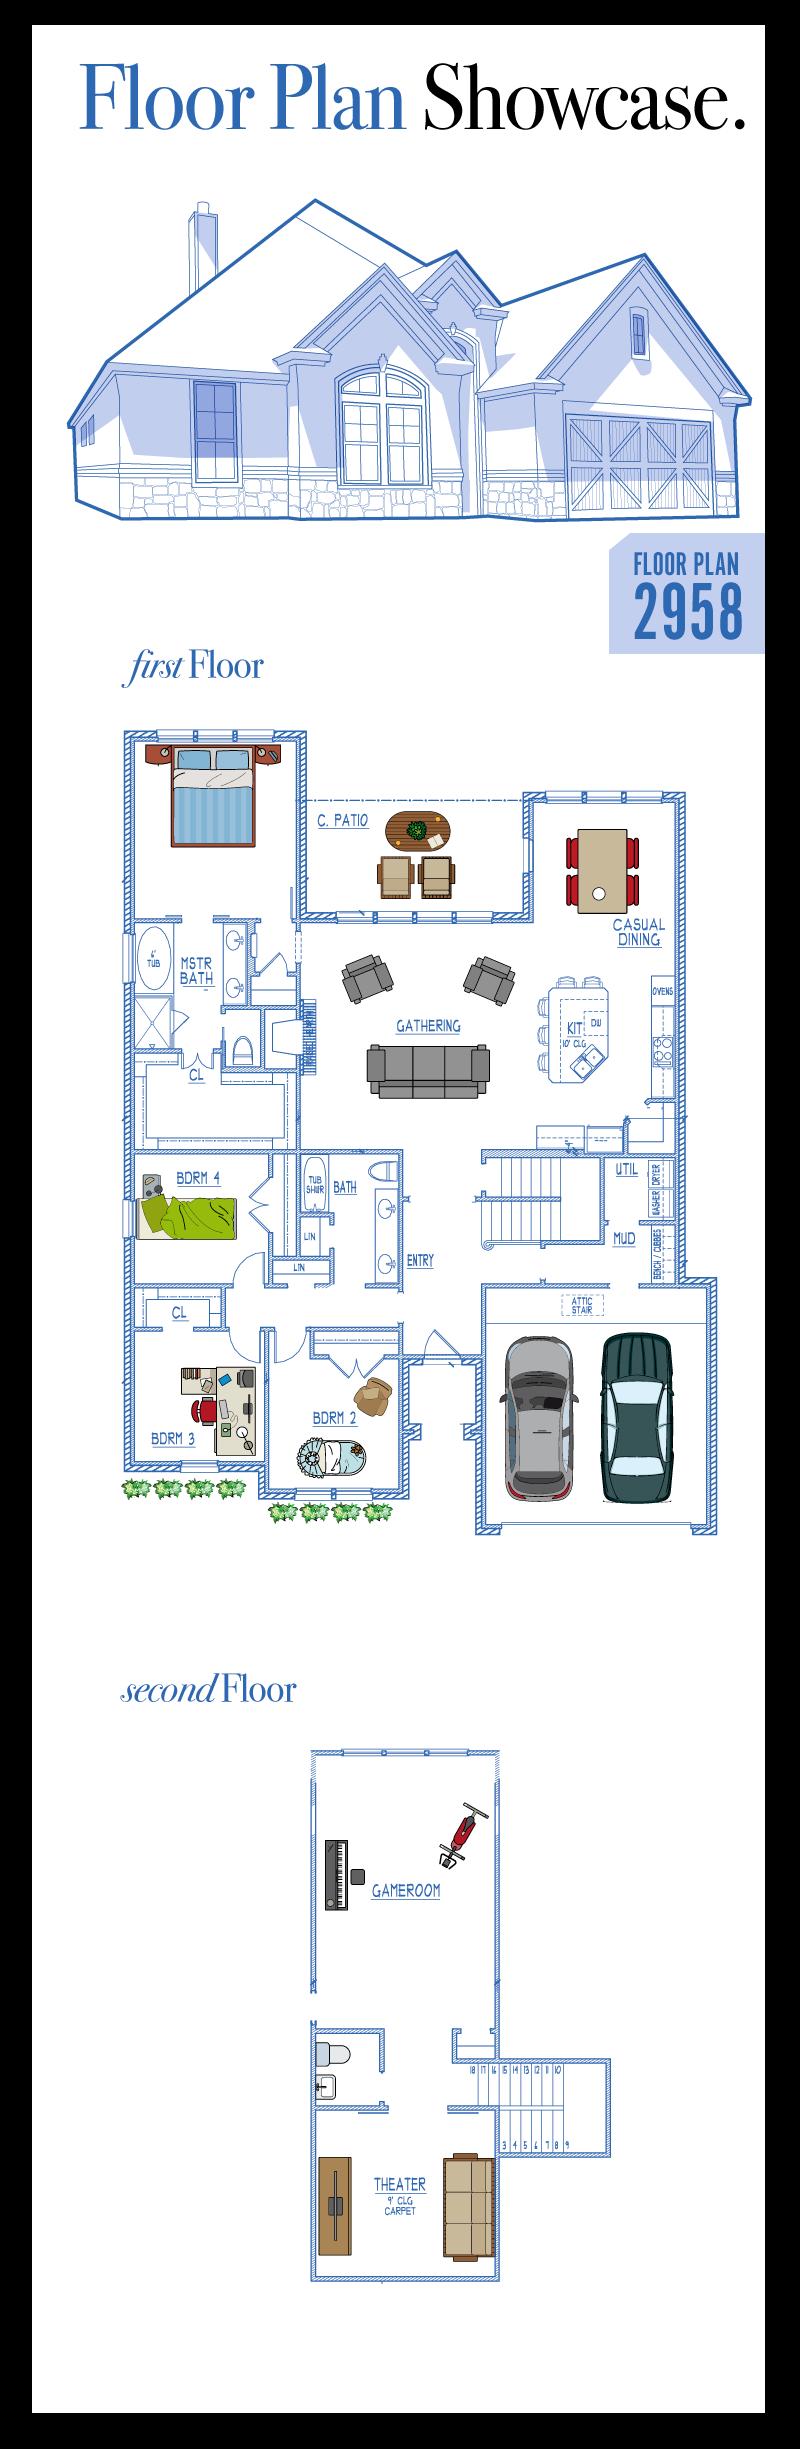 floorplanshowcase2958